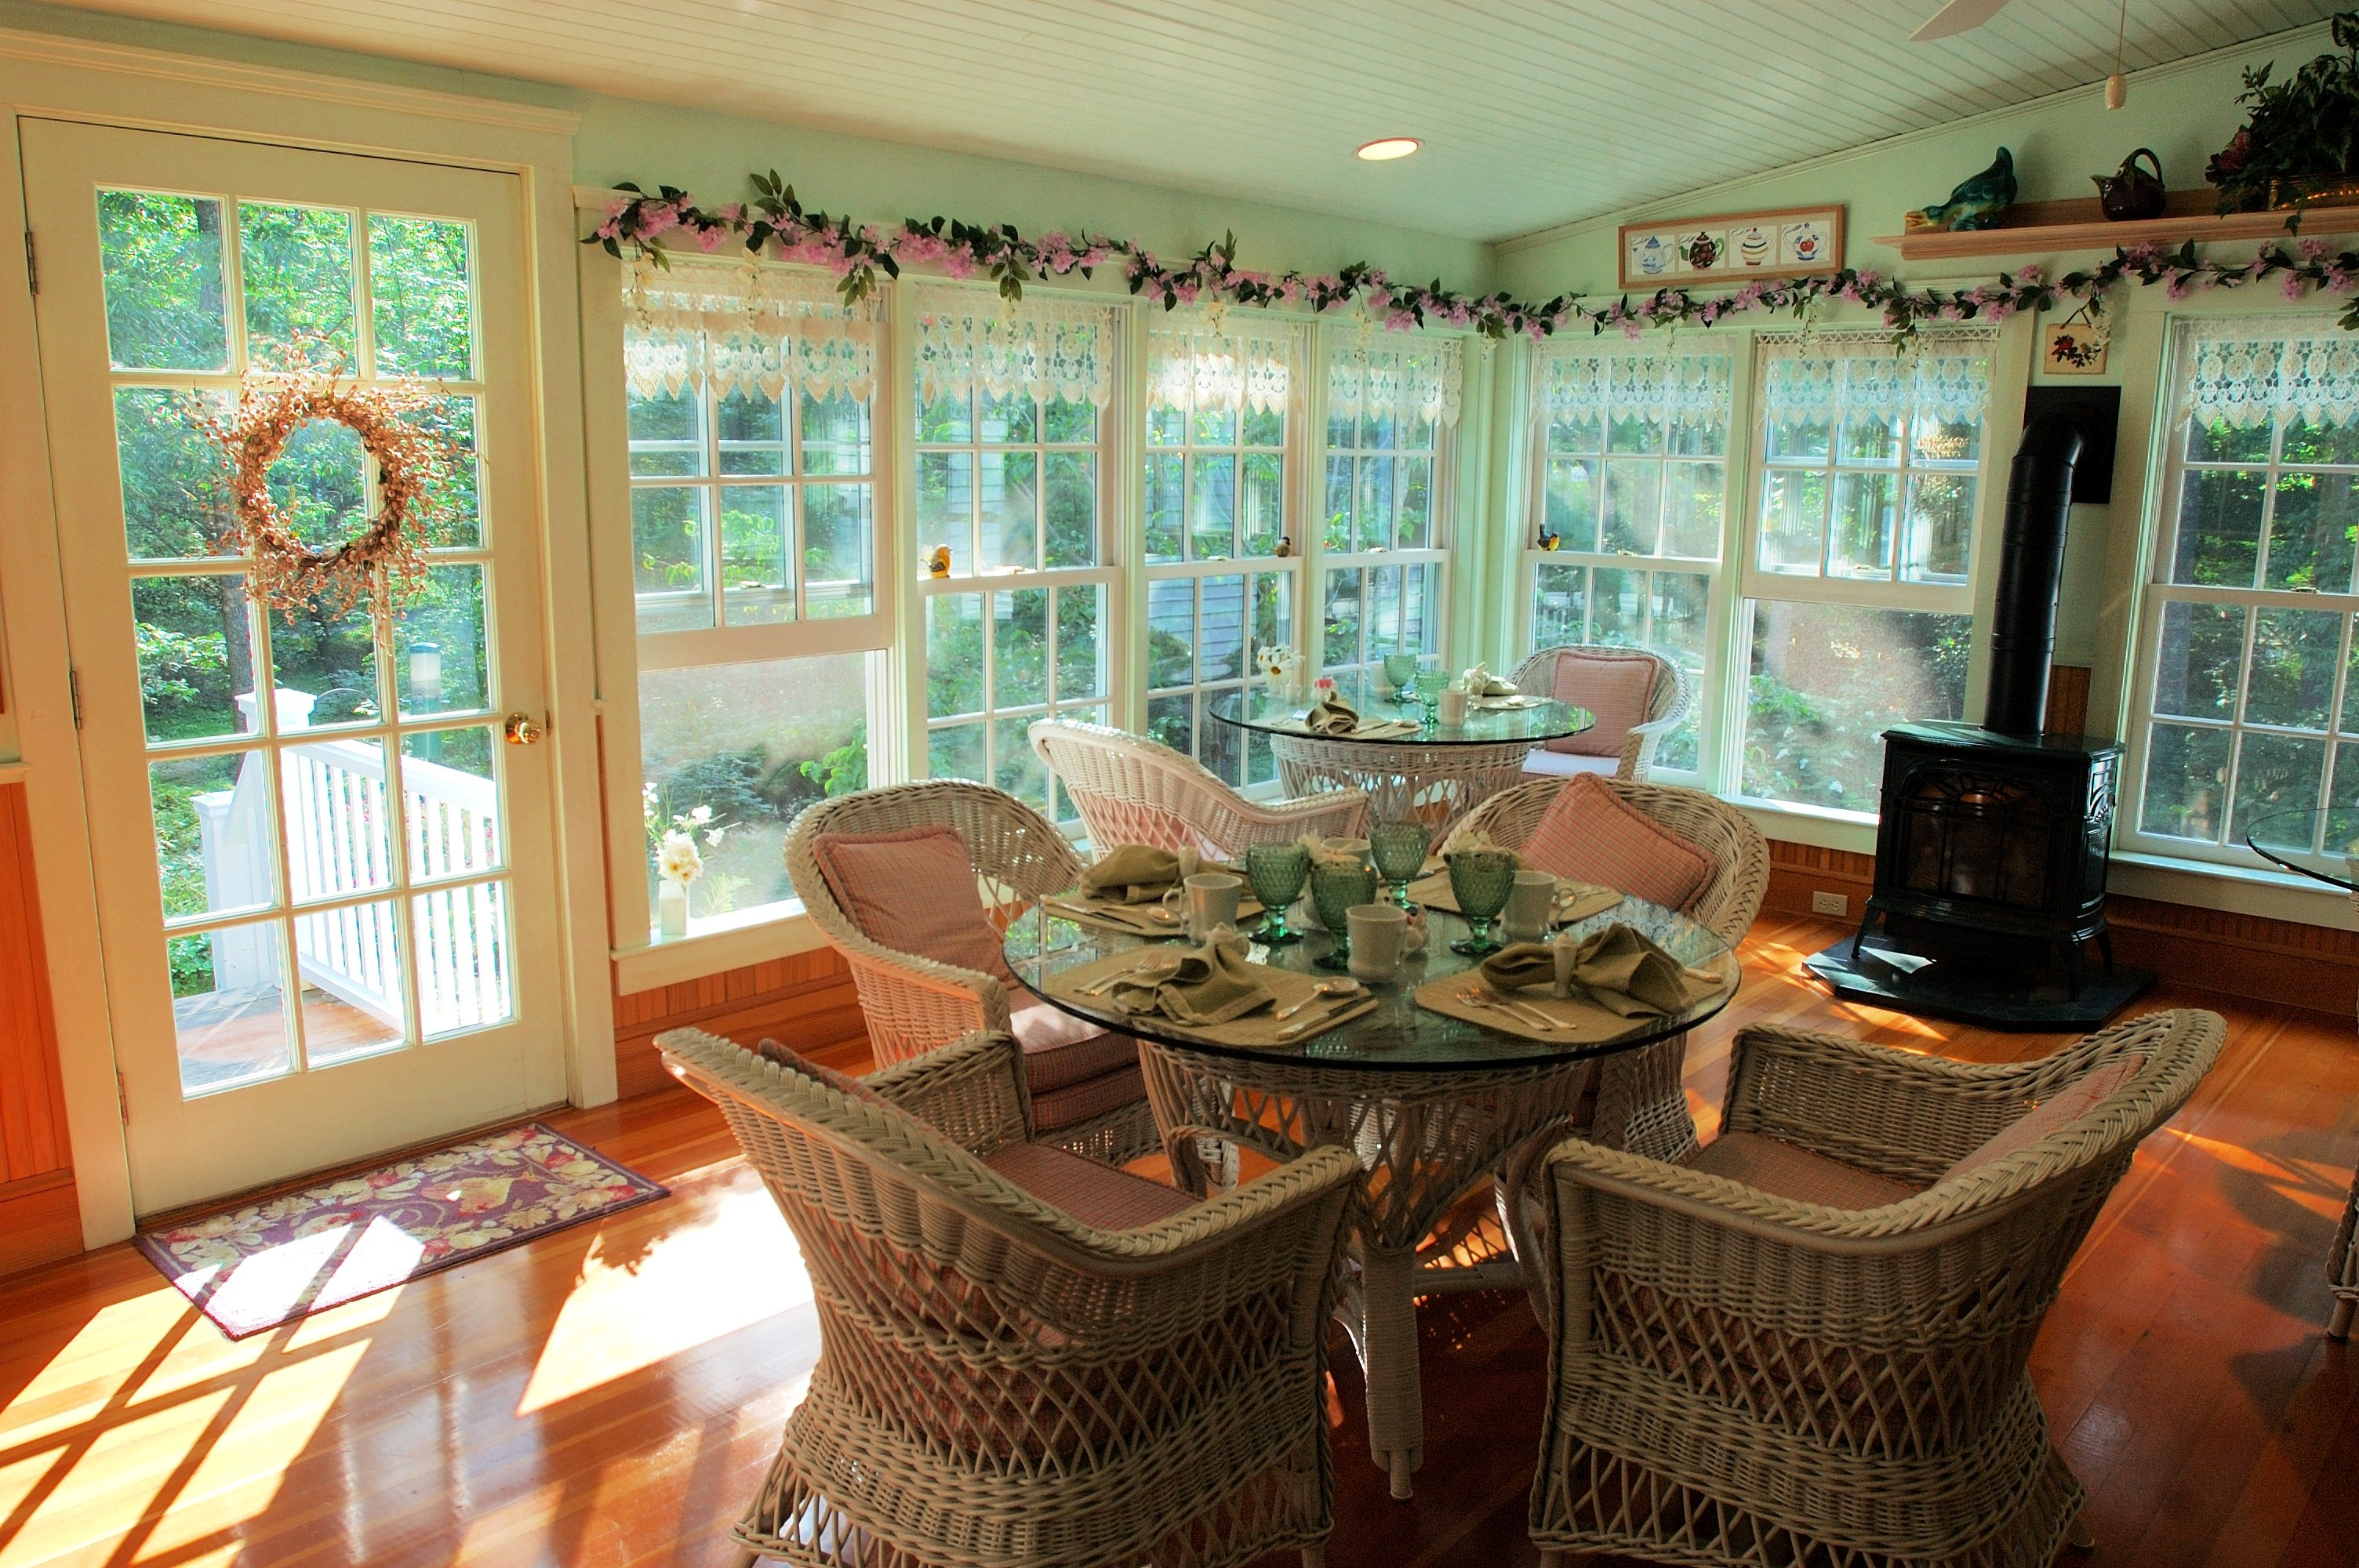 The breakfast porch